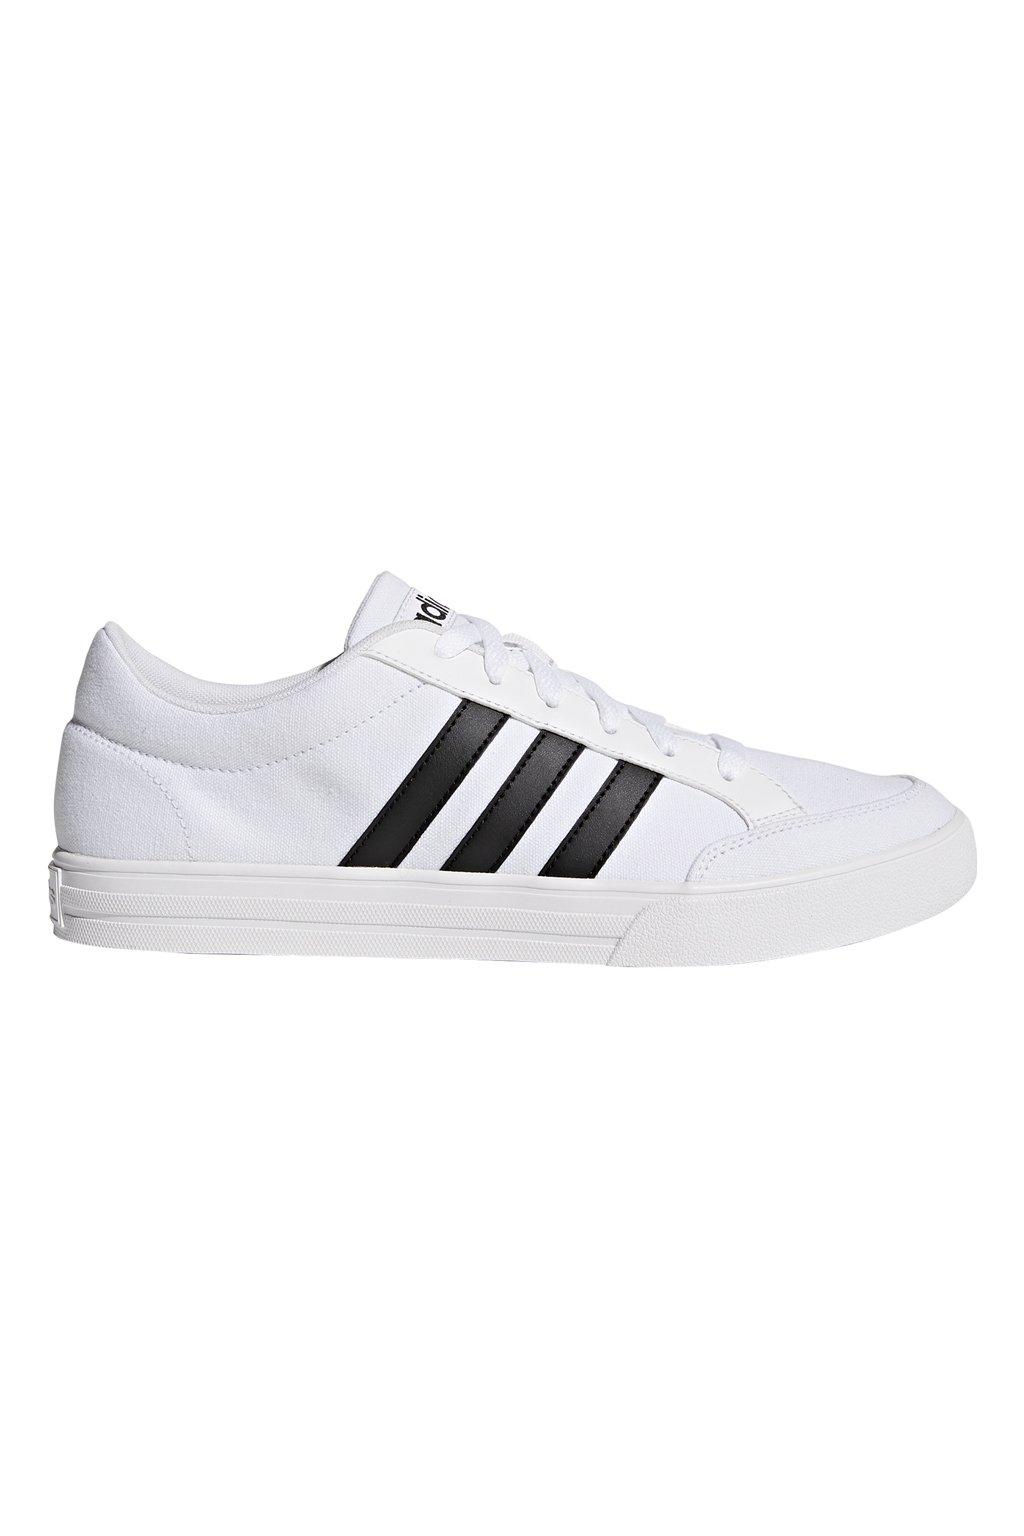 Tenisky Adidas VS Set biele AW3889